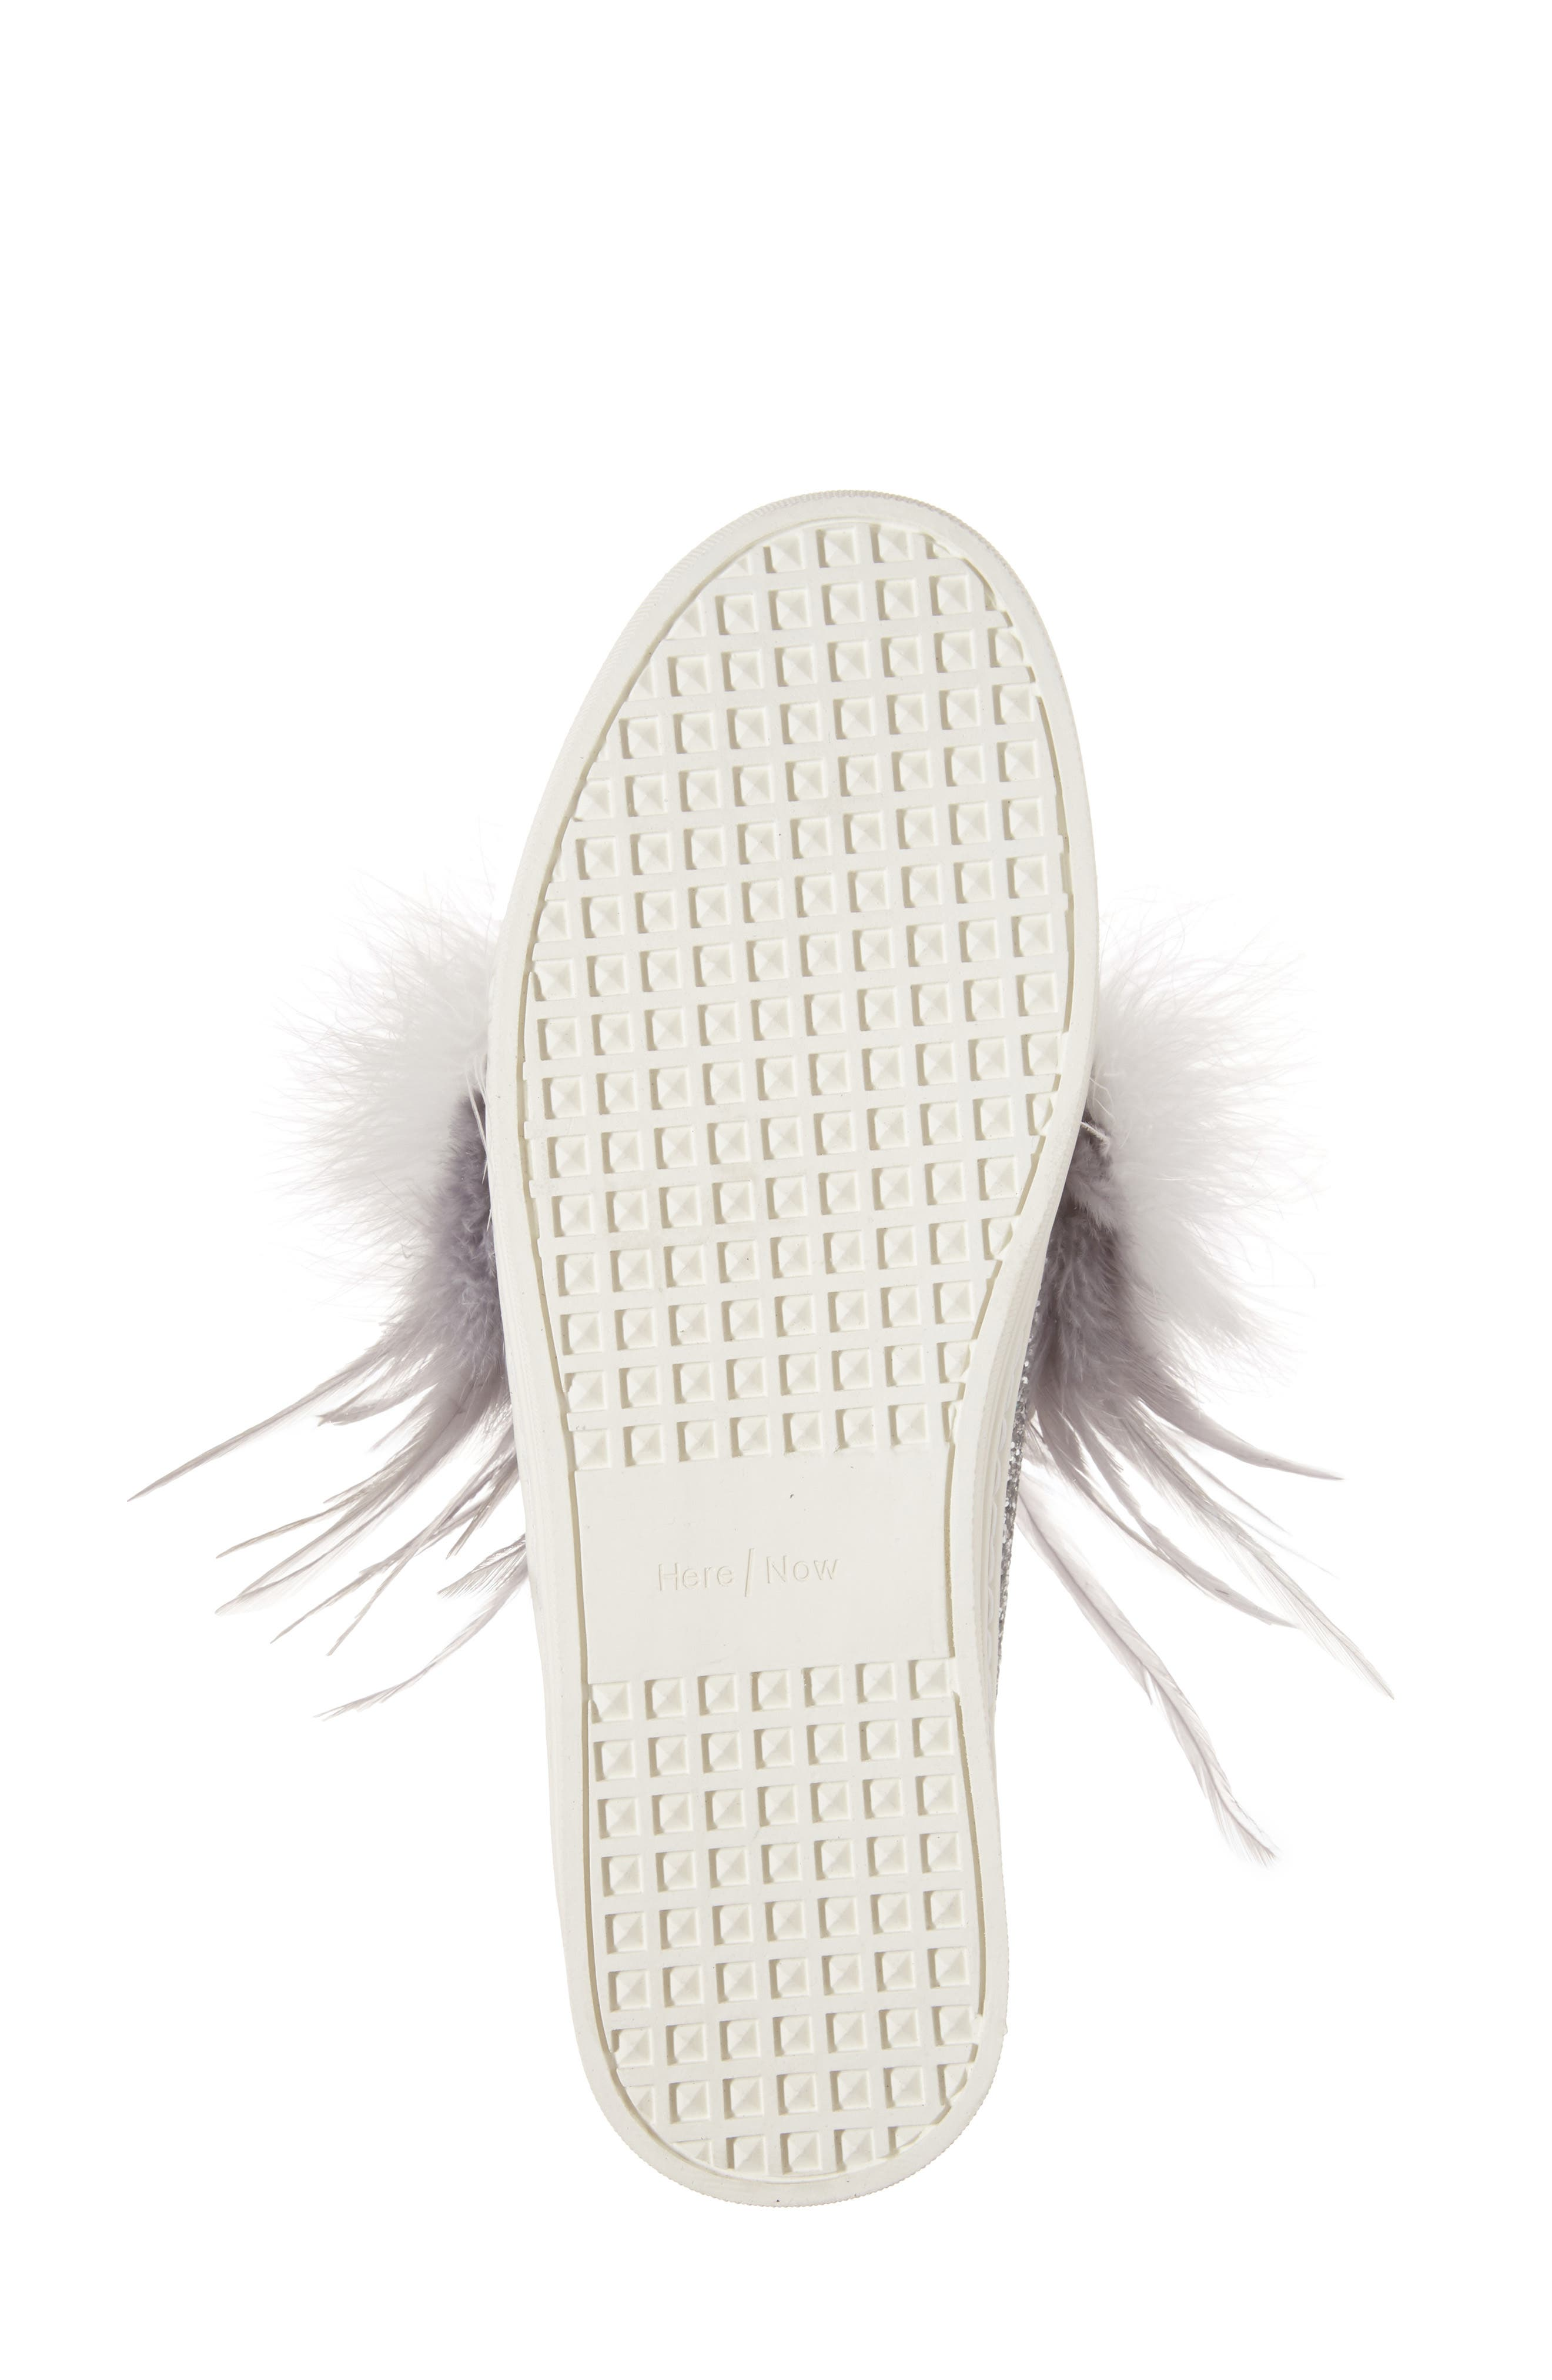 Kate Feathered Slip-On Sneaker,                             Alternate thumbnail 6, color,                             020